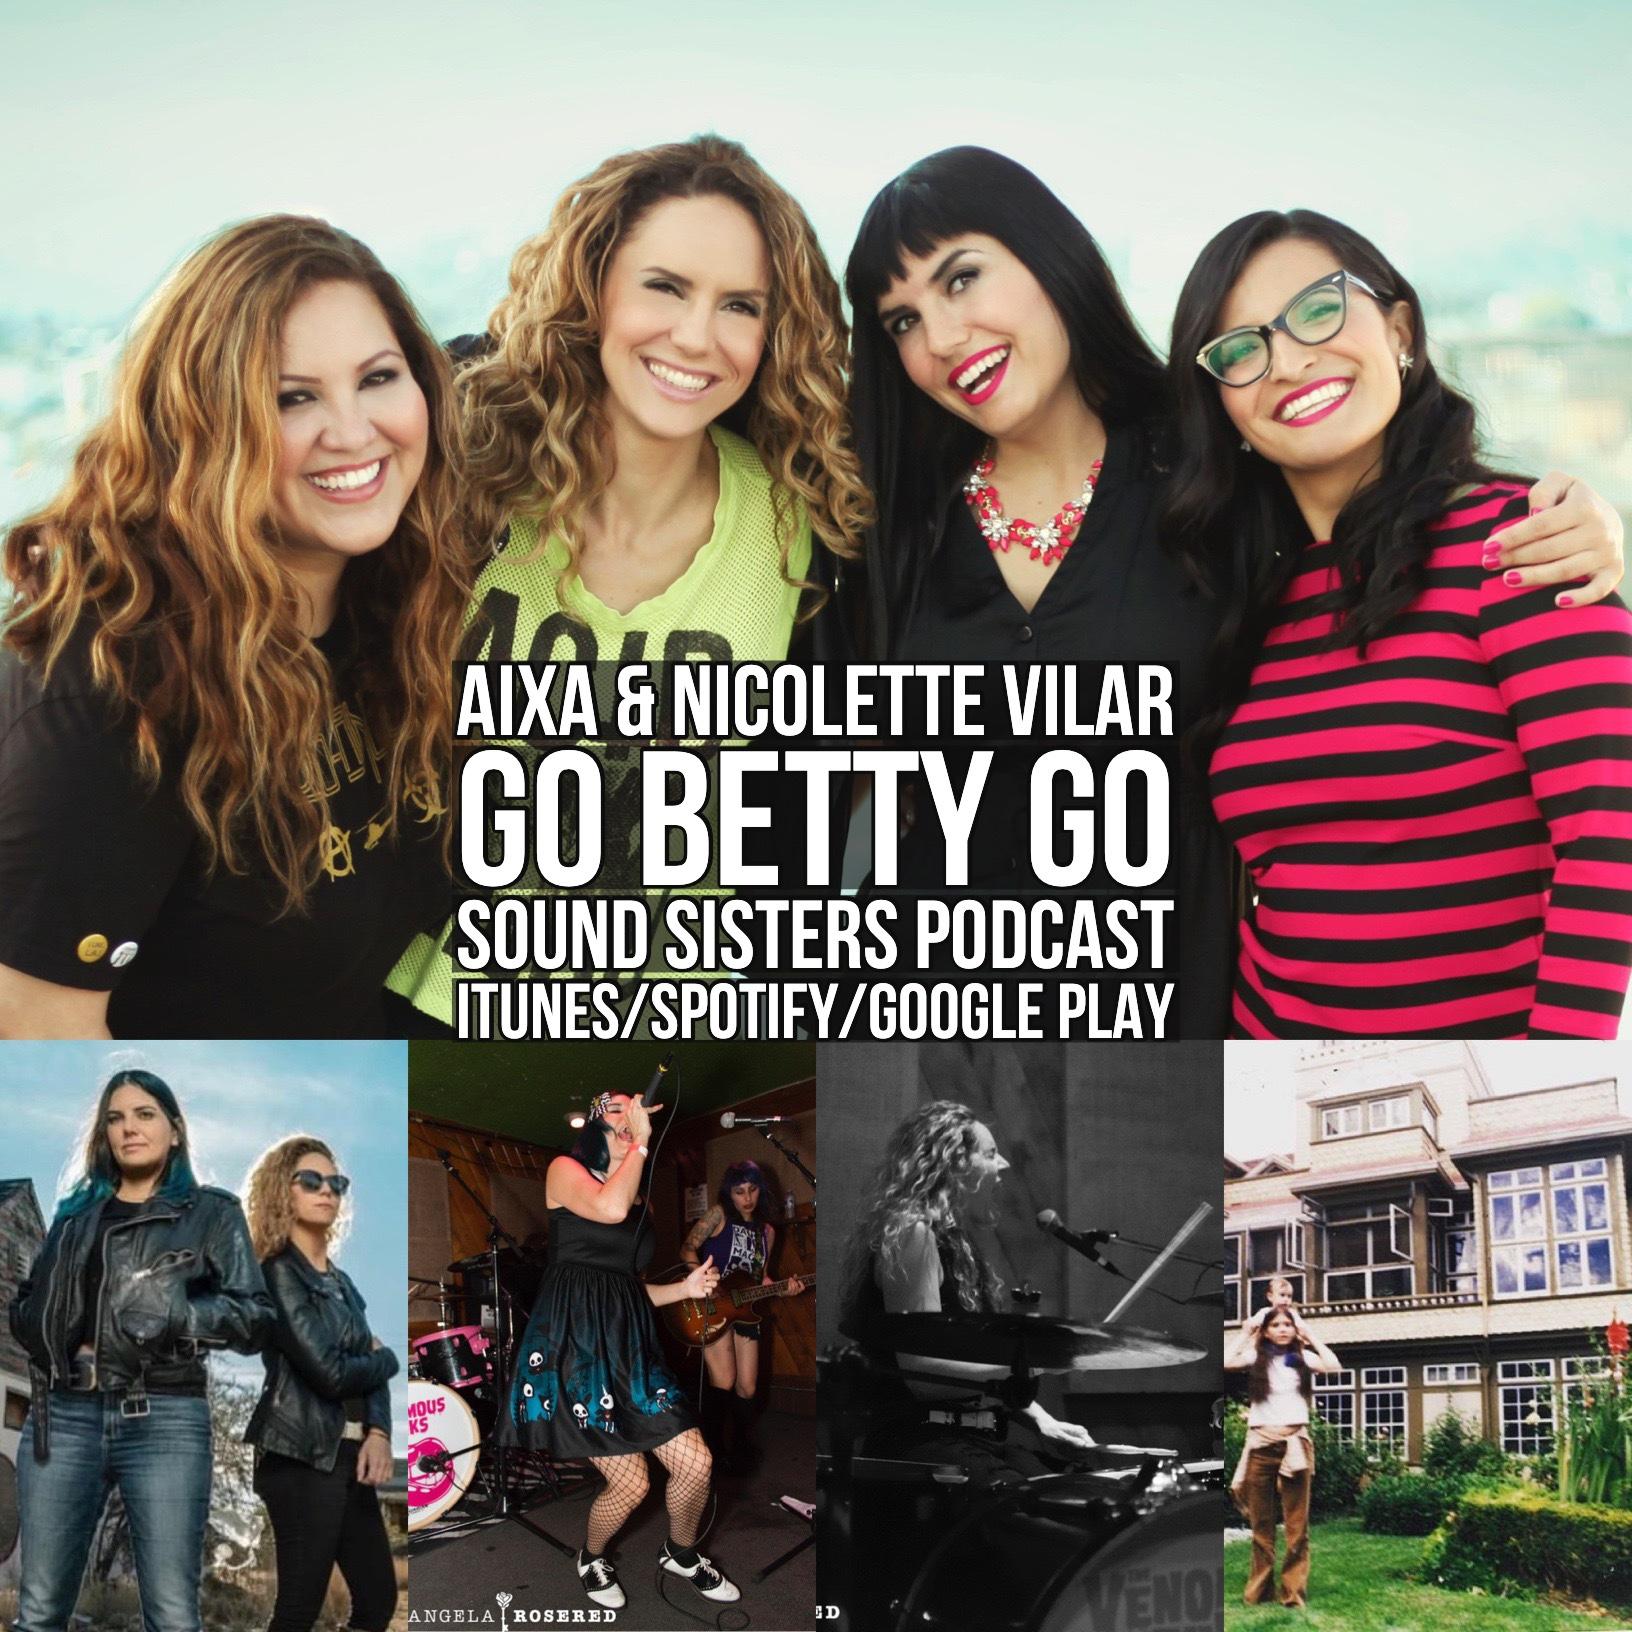 Sound Sisters Episode 17-Aixa & Nicolette Vilar of Go Betty Go